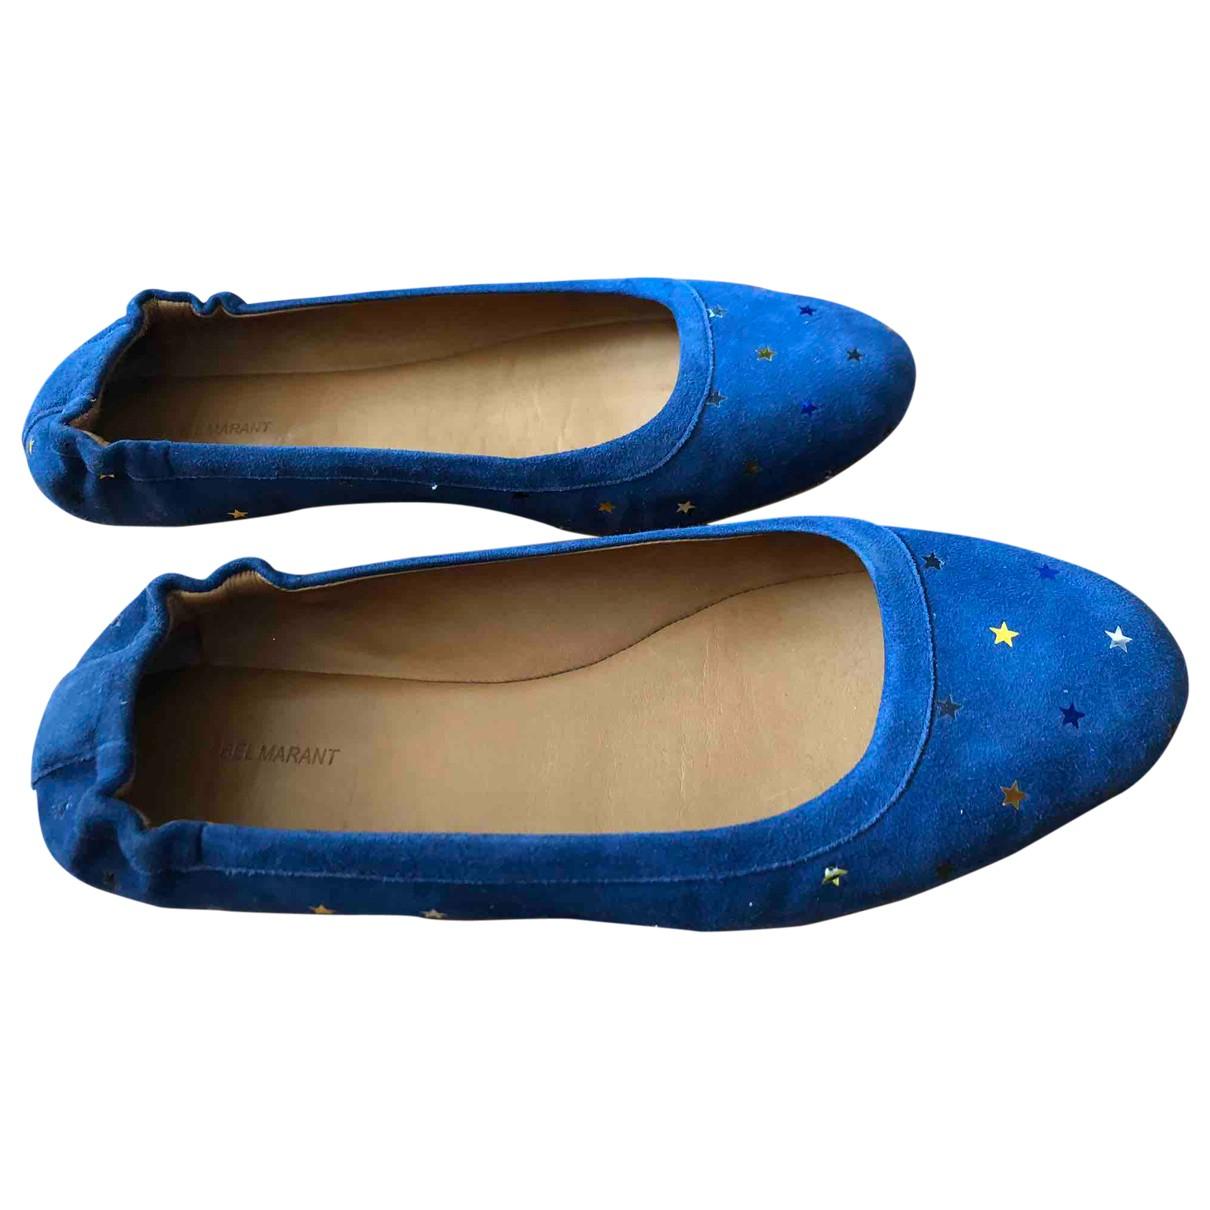 Isabel Marant N Blue Suede Ballet flats for Women 37 EU